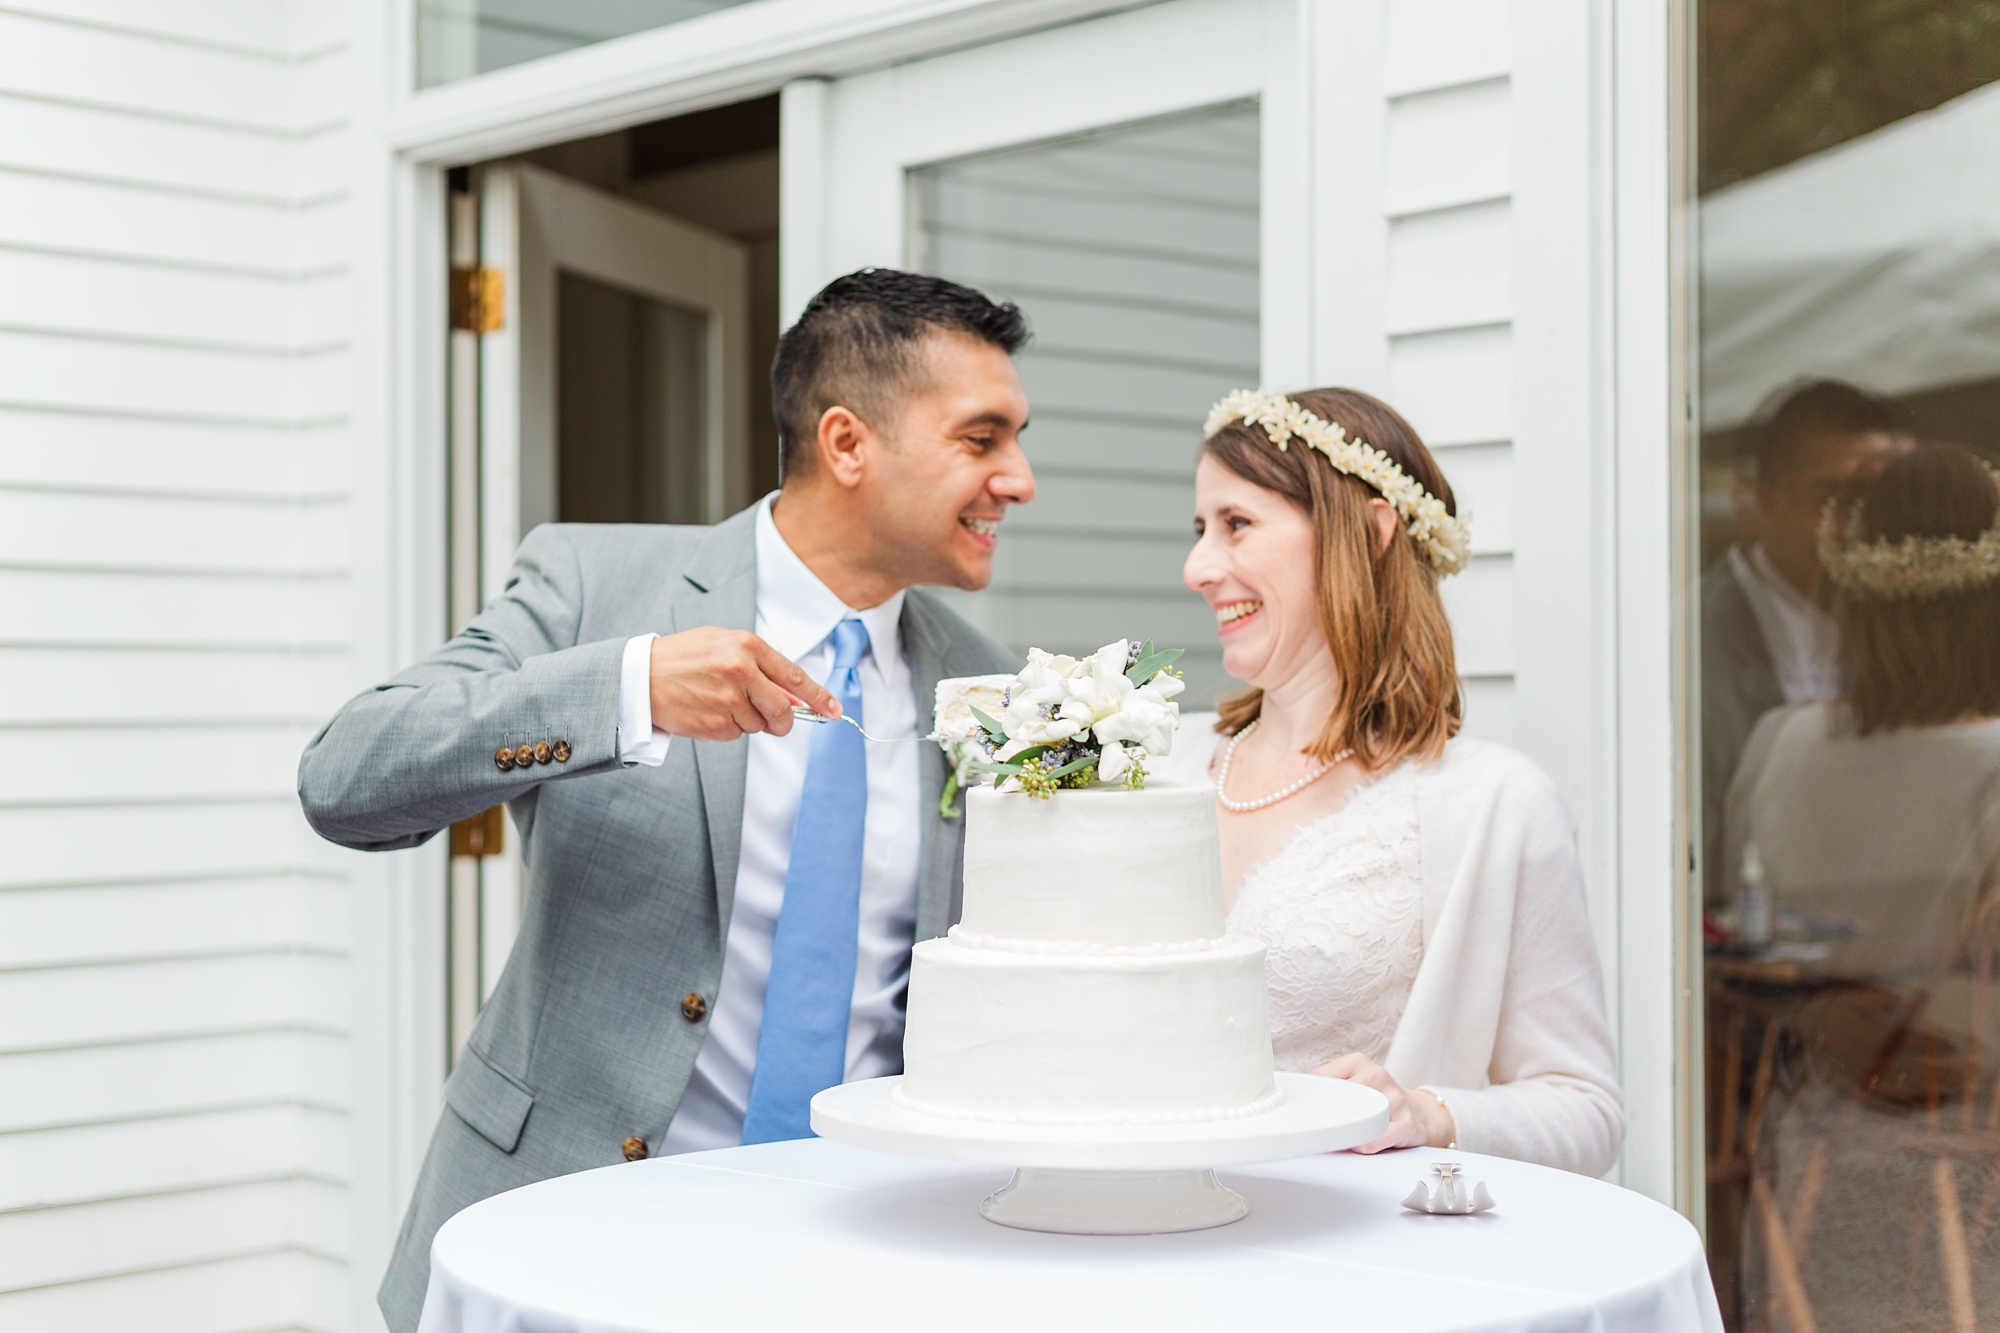 newlyweds cut wedding cake during Mobile AL wedding day